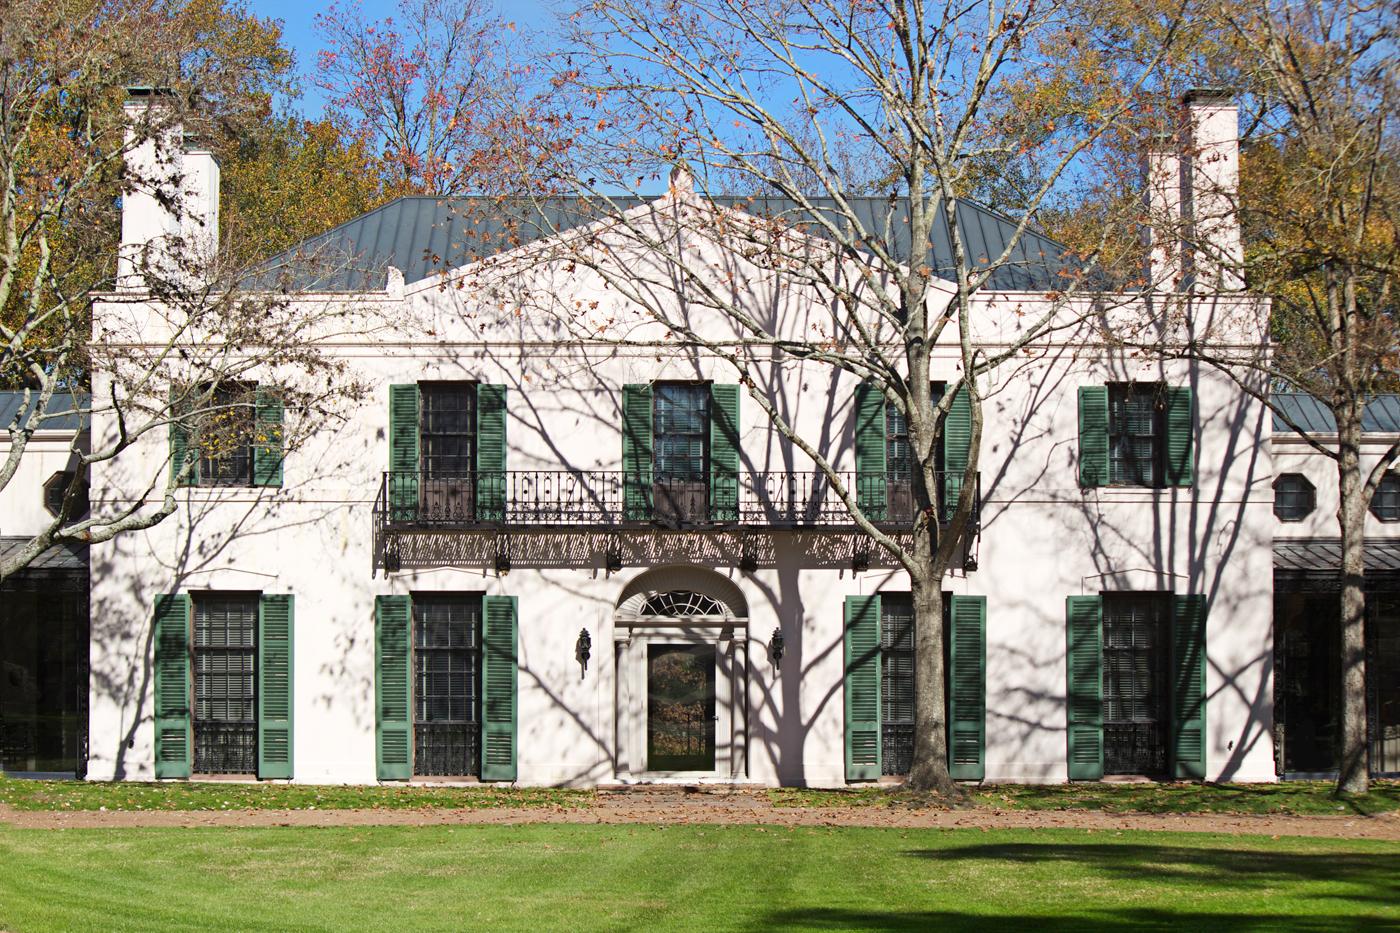 edwardian mansion at bayou bend - photo copyright Allison Beth Cooling